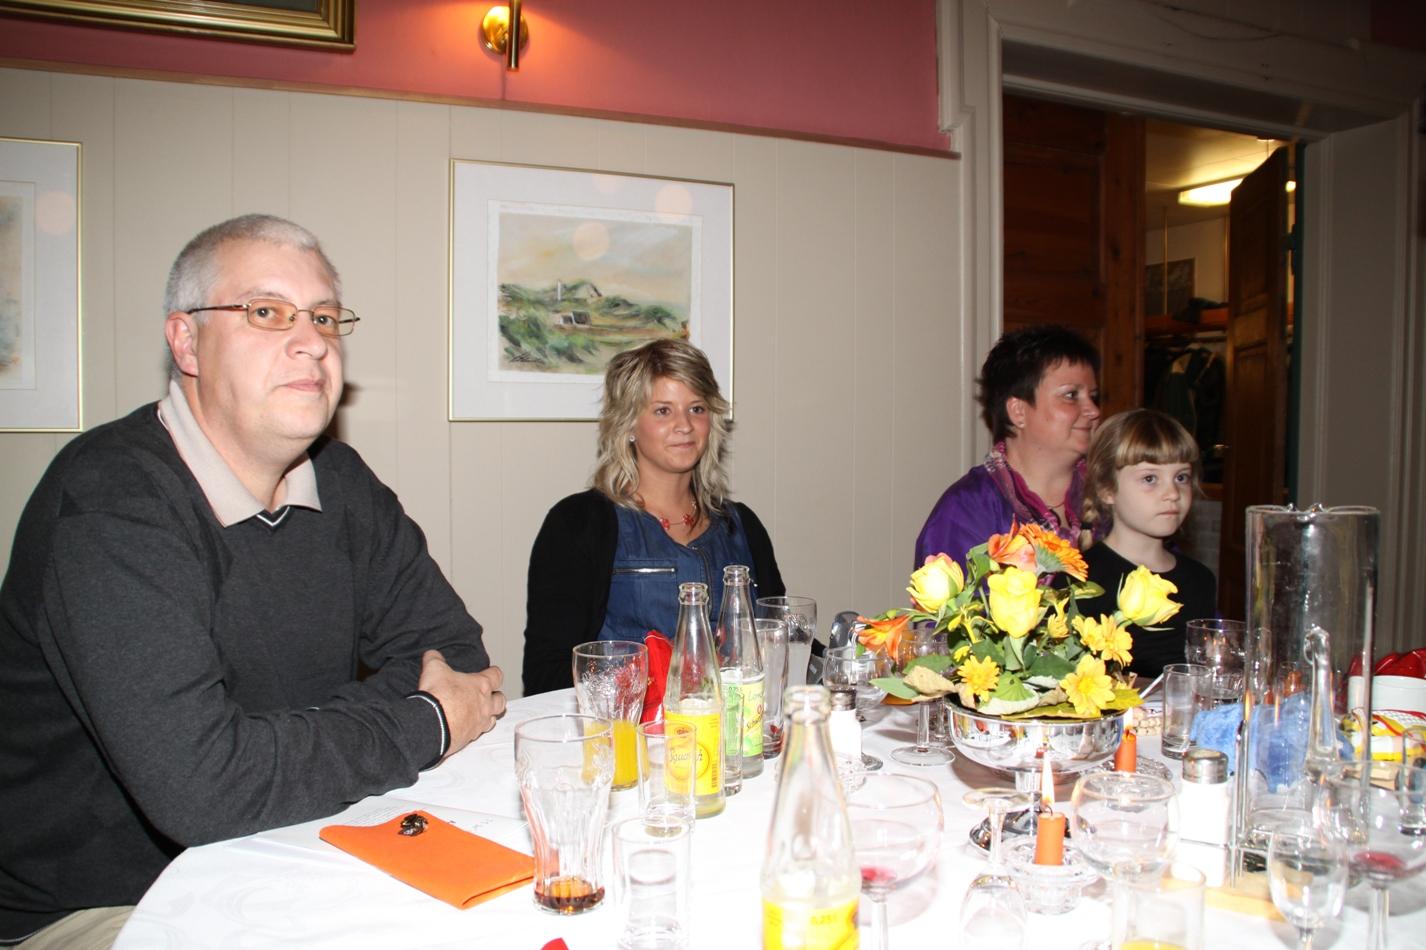 IMG_5155 JØRGEN 75ÅR 08-11-2008 (127)